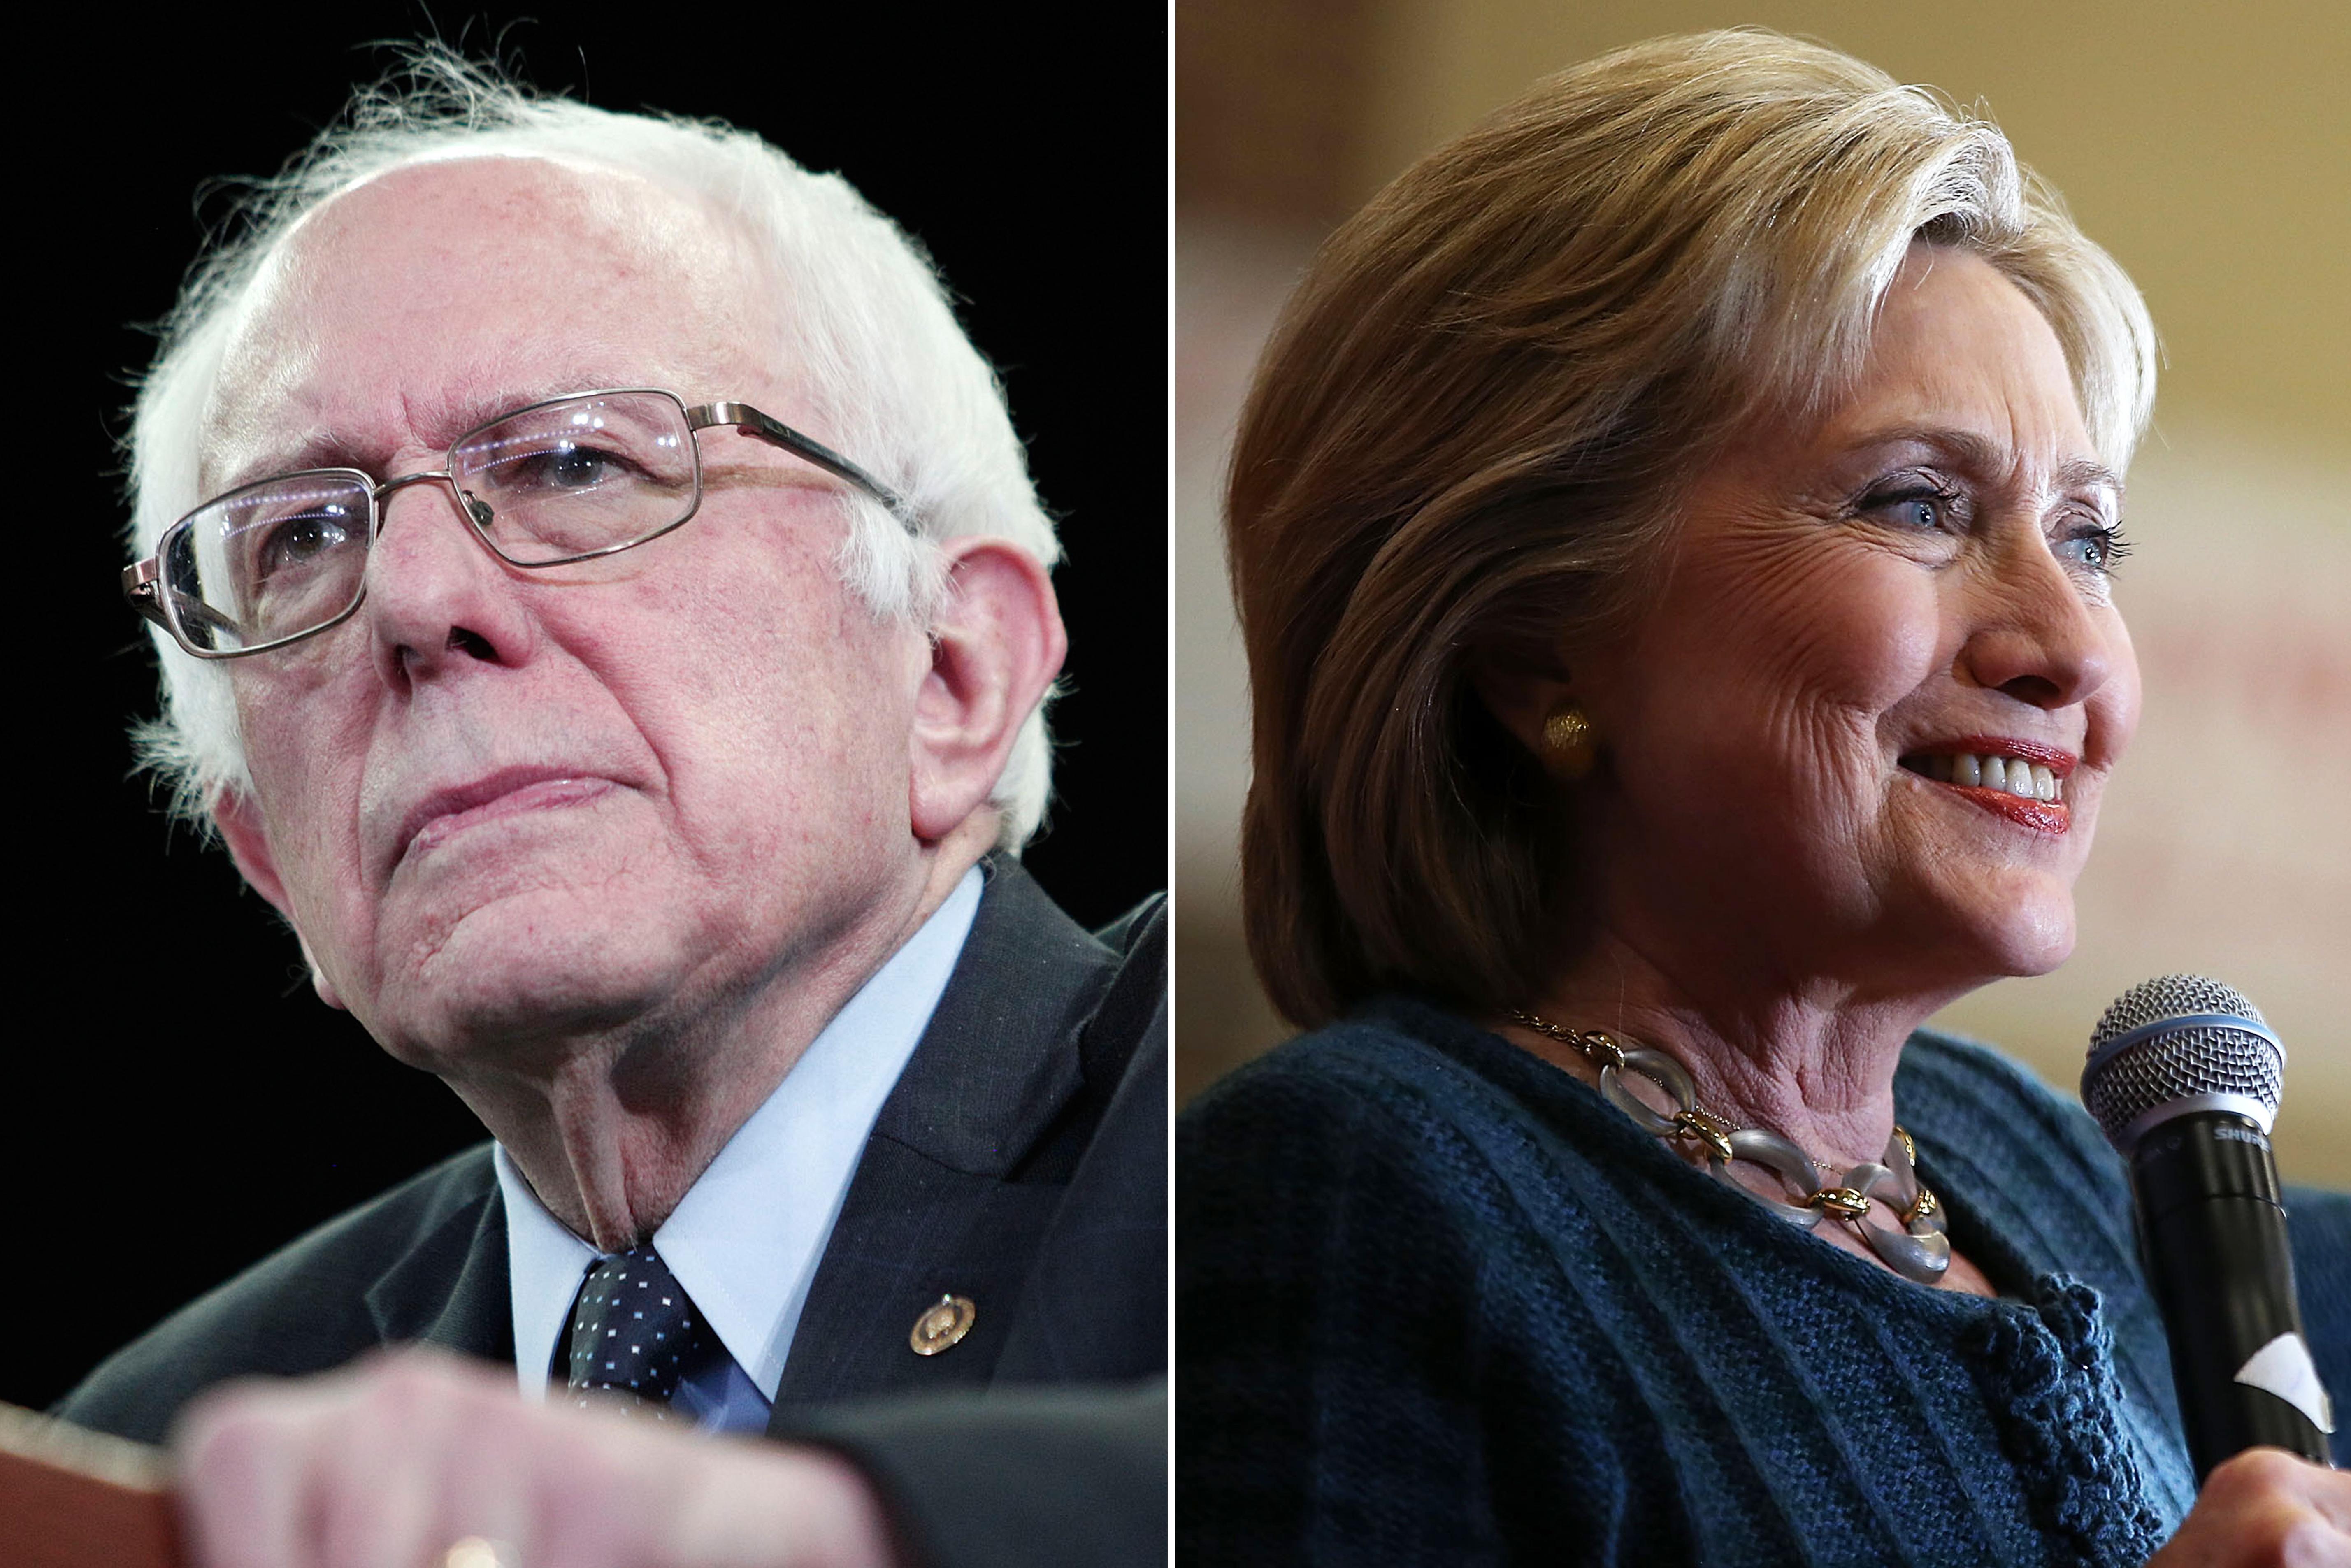 Bernie Sanders on Feb. 15th, 2016 in Ypsilanti, Michigan (L); Hillary Clinton on Jan. 26, 2016 in Marshalltown, Iowa.